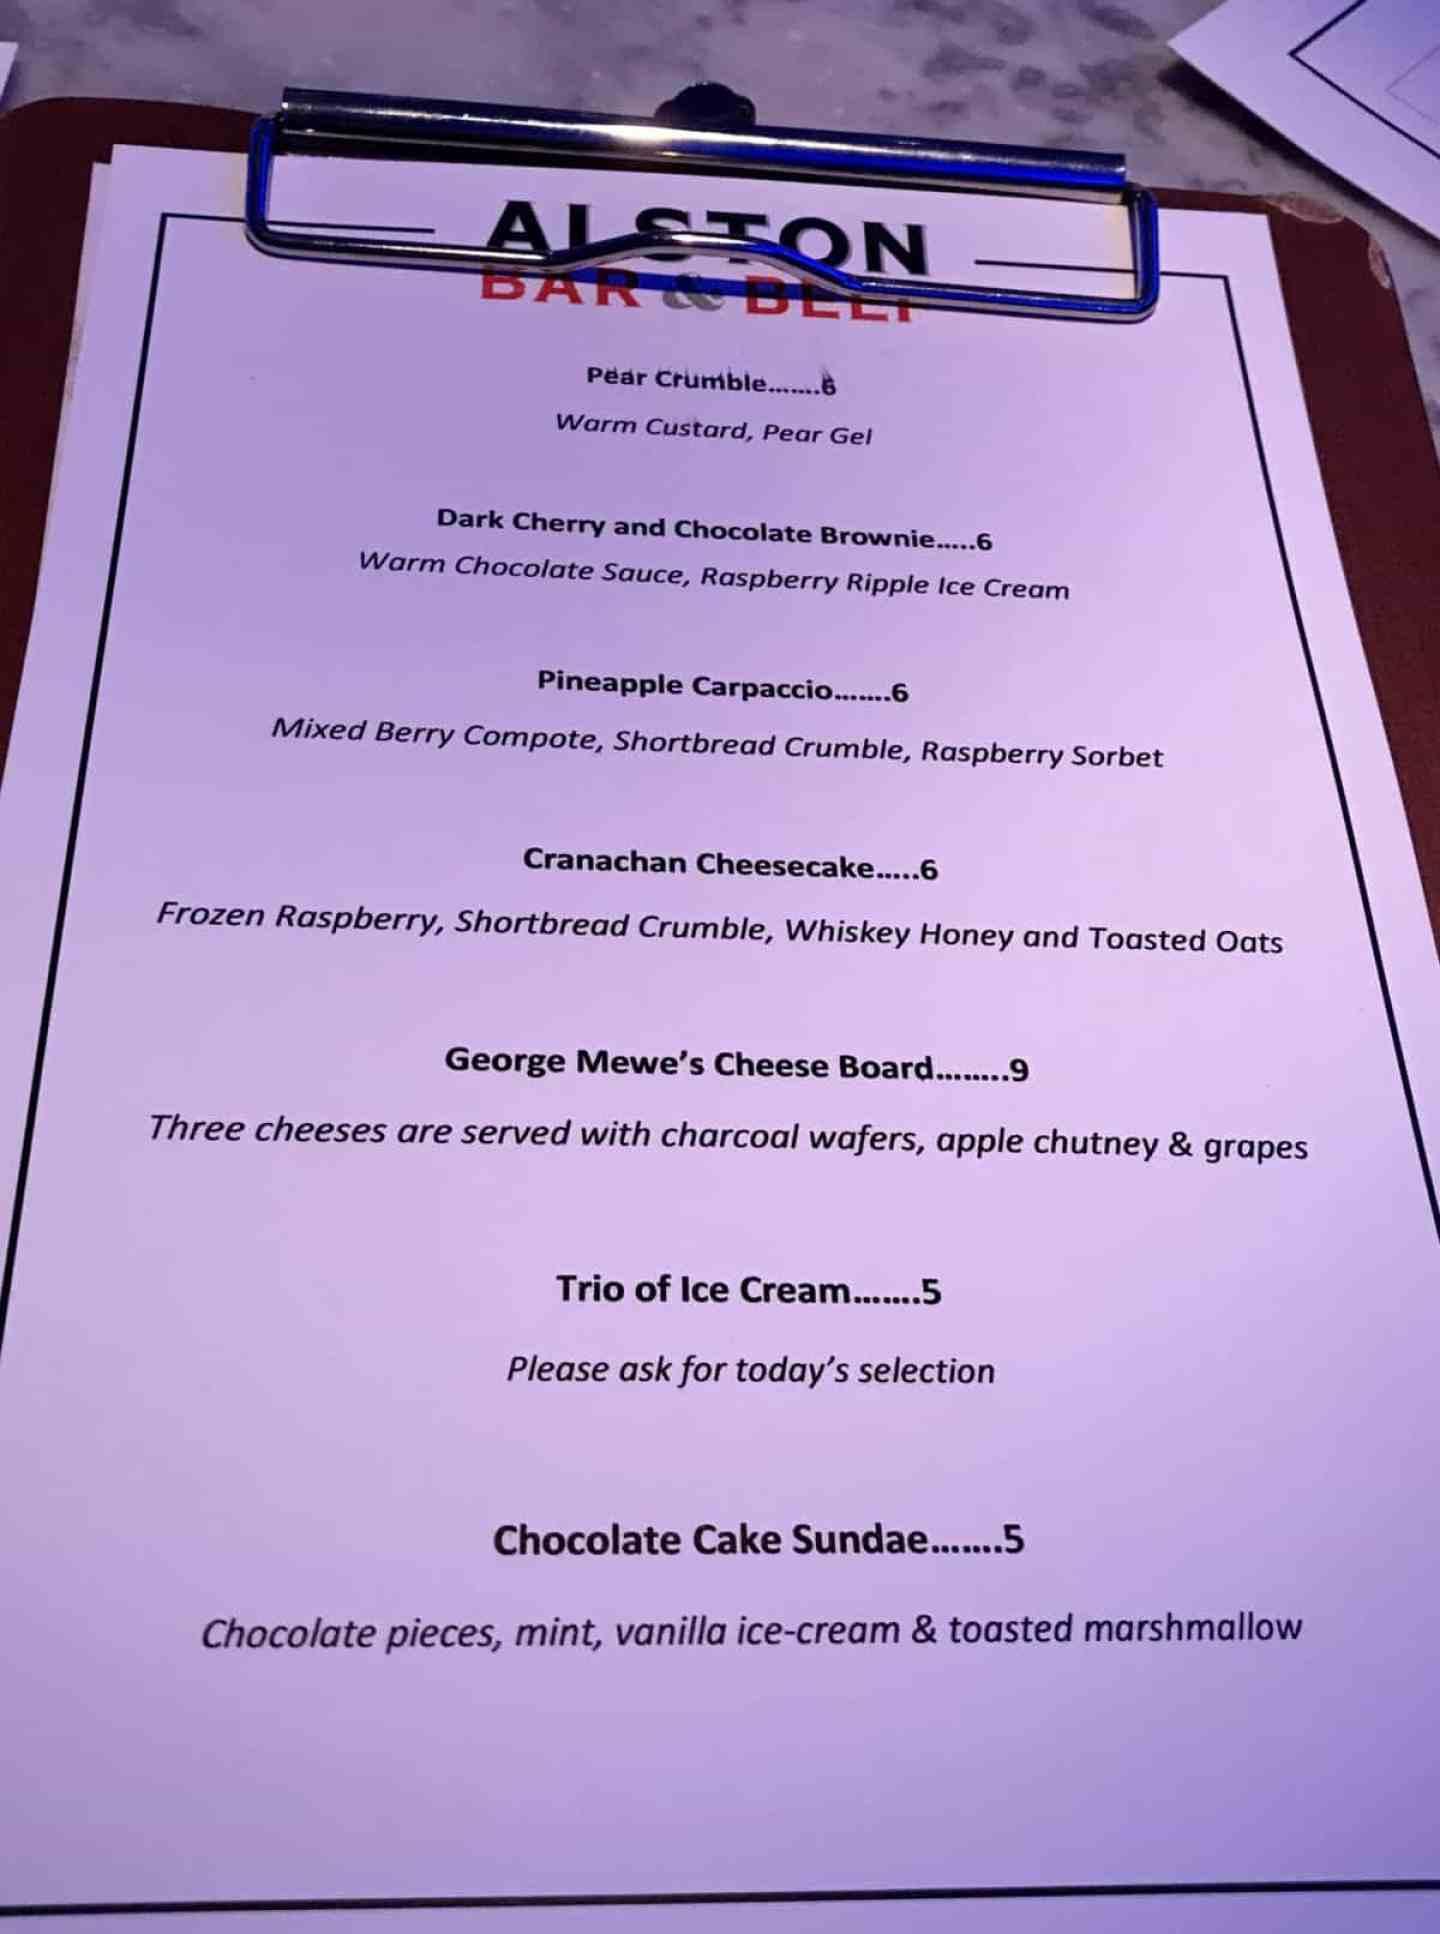 Alston bar and beef dessert menu